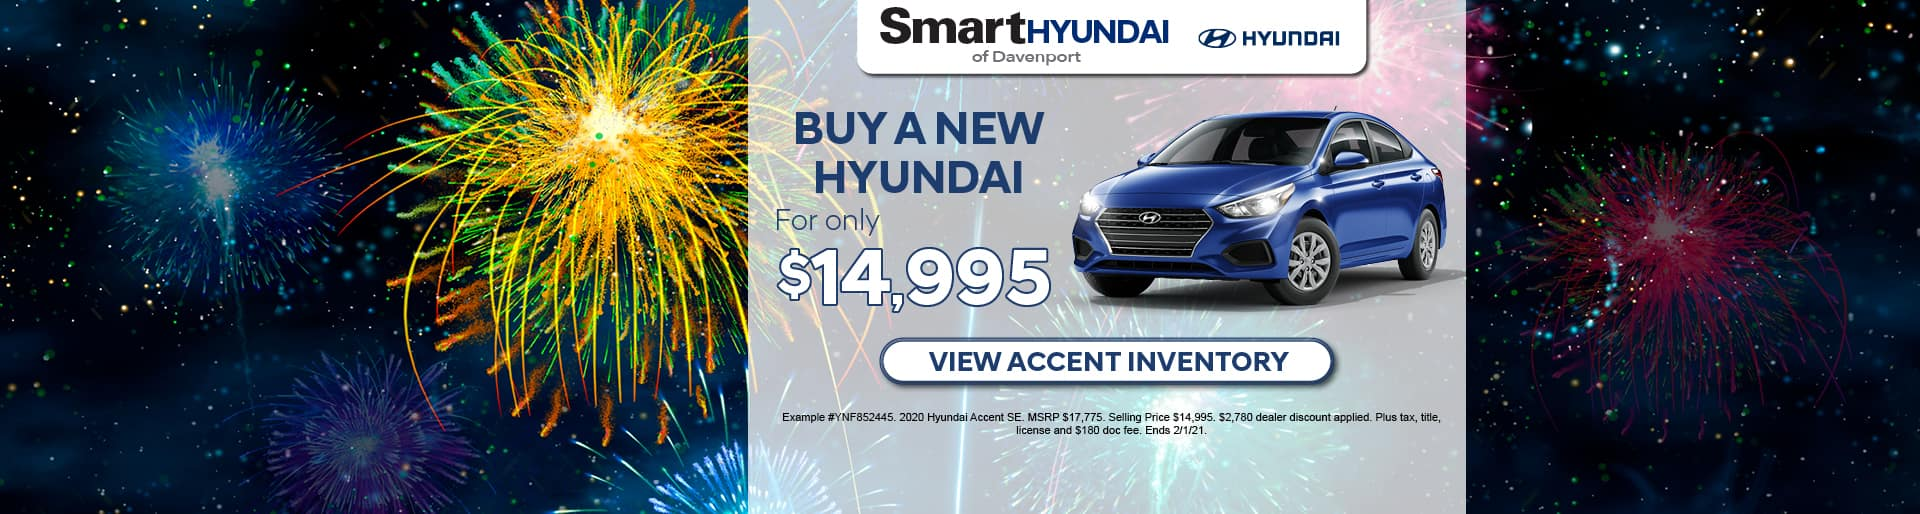 Buy a New Hyundai